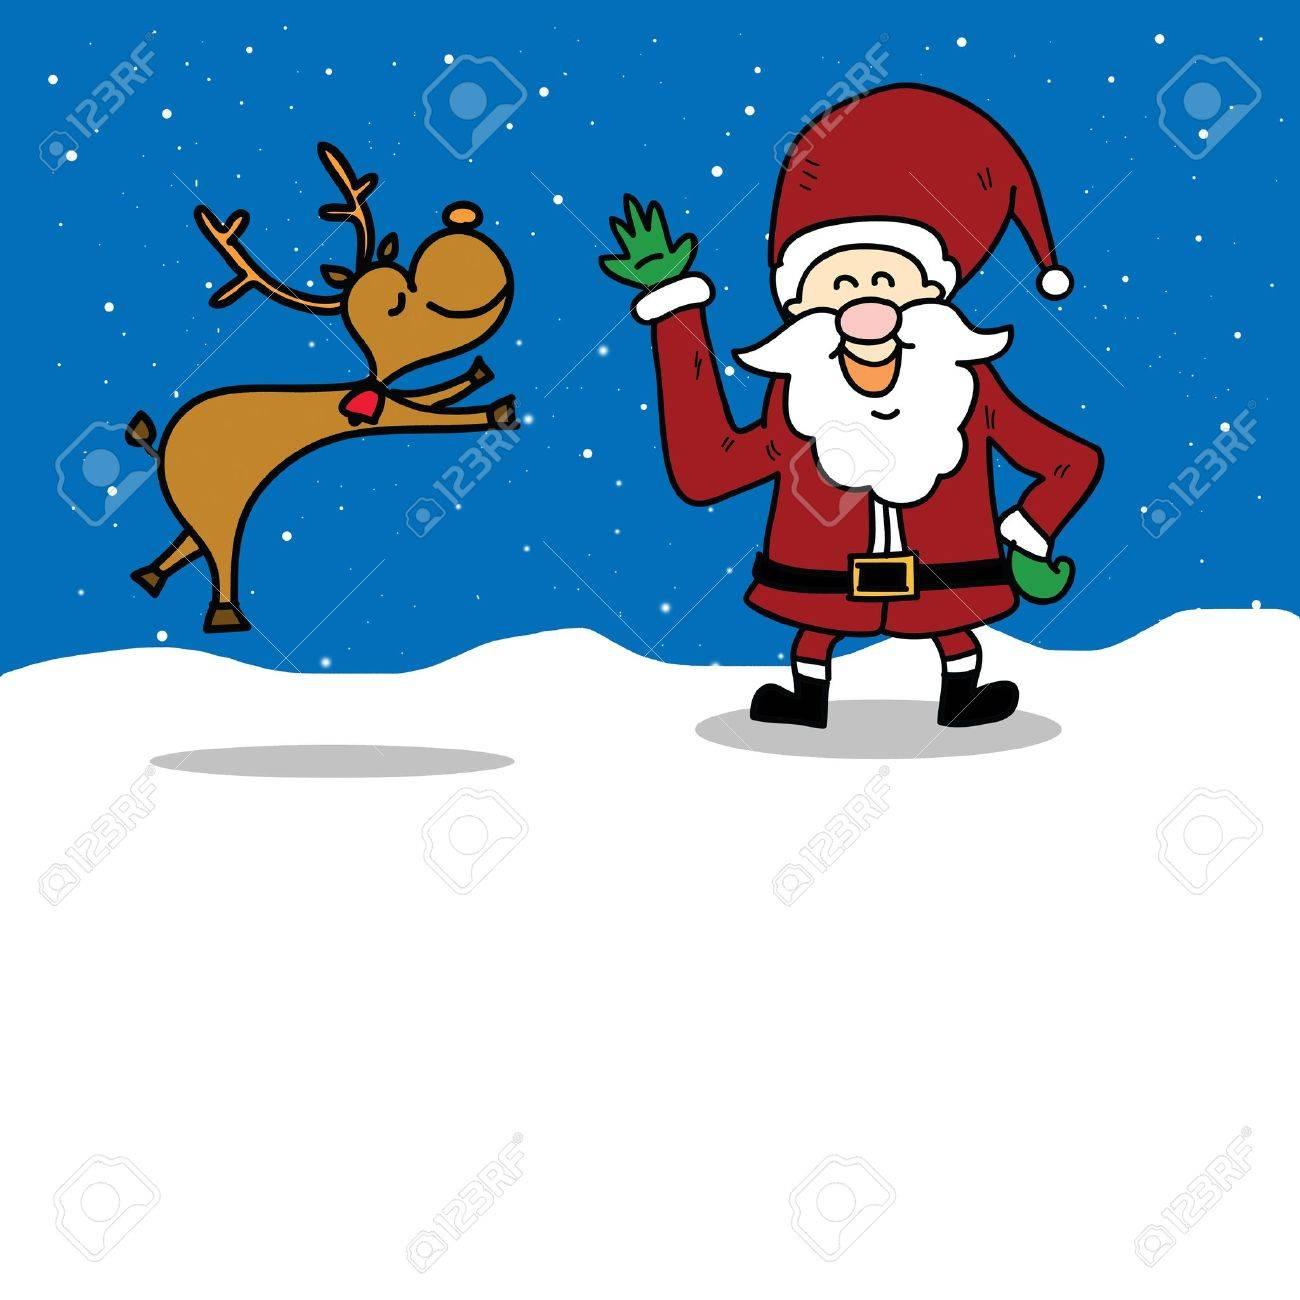 funny santa claus and reindeer cartoon hand drawn illustration Stock Vector - 16055595